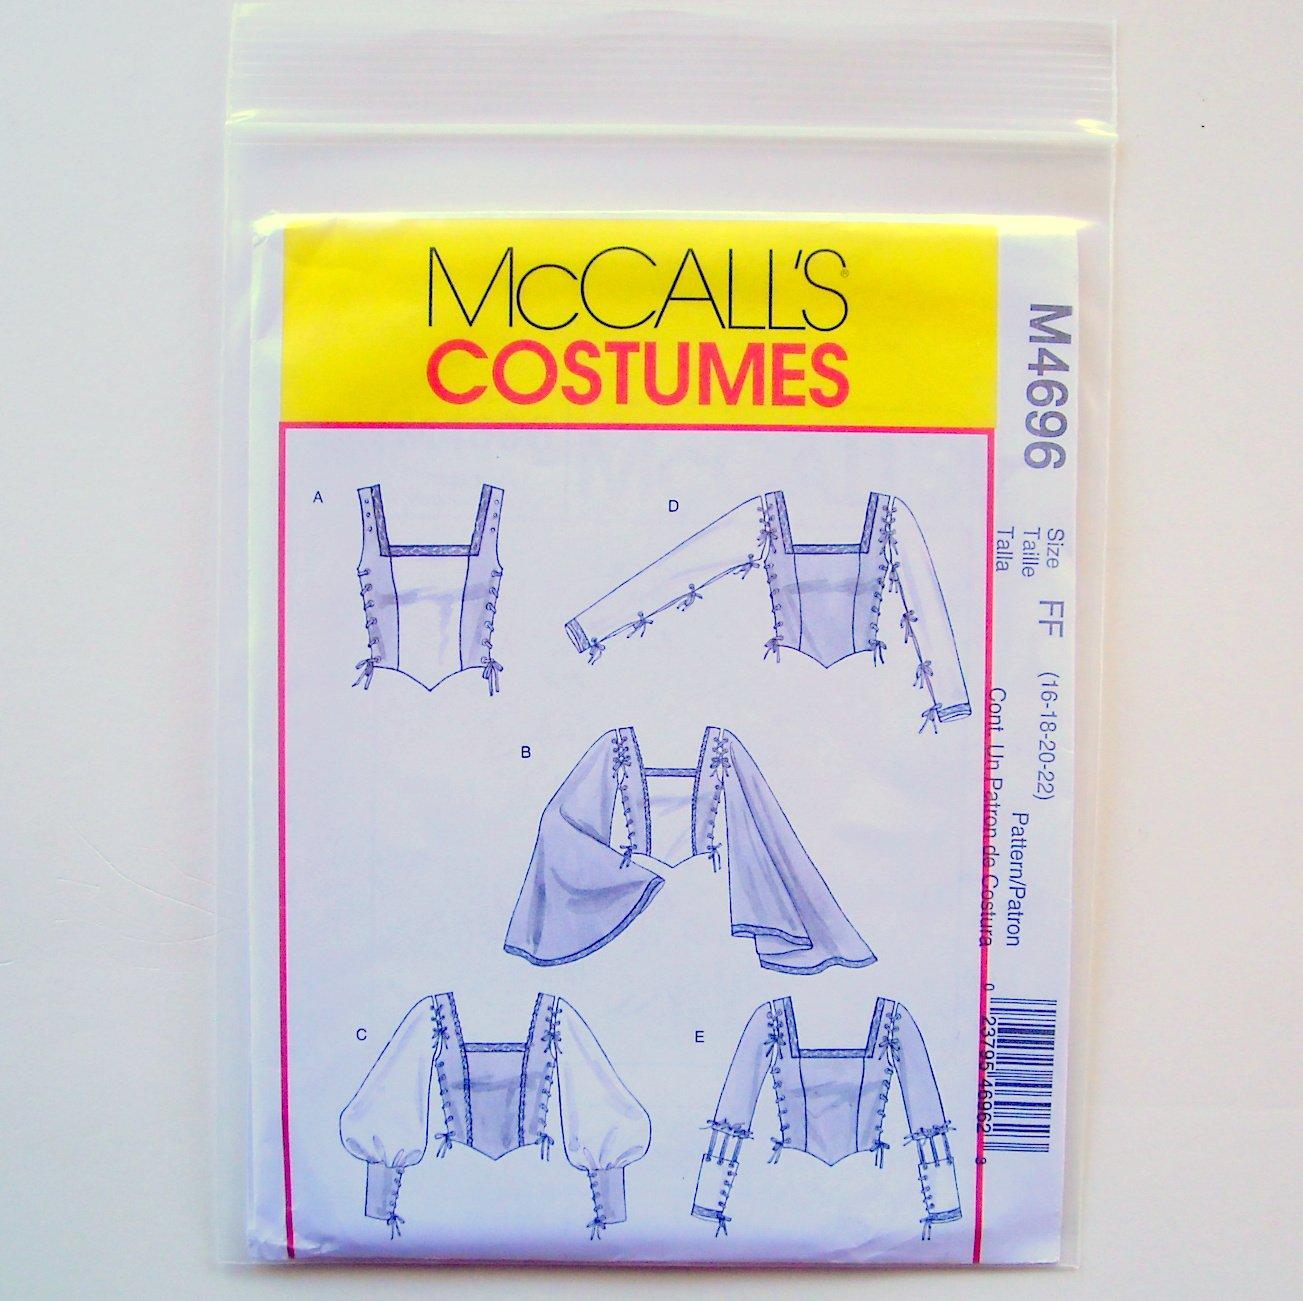 Misses Renaissance Tops 16 18 20 22 McCalls Costumes Sewing Pattern M4696